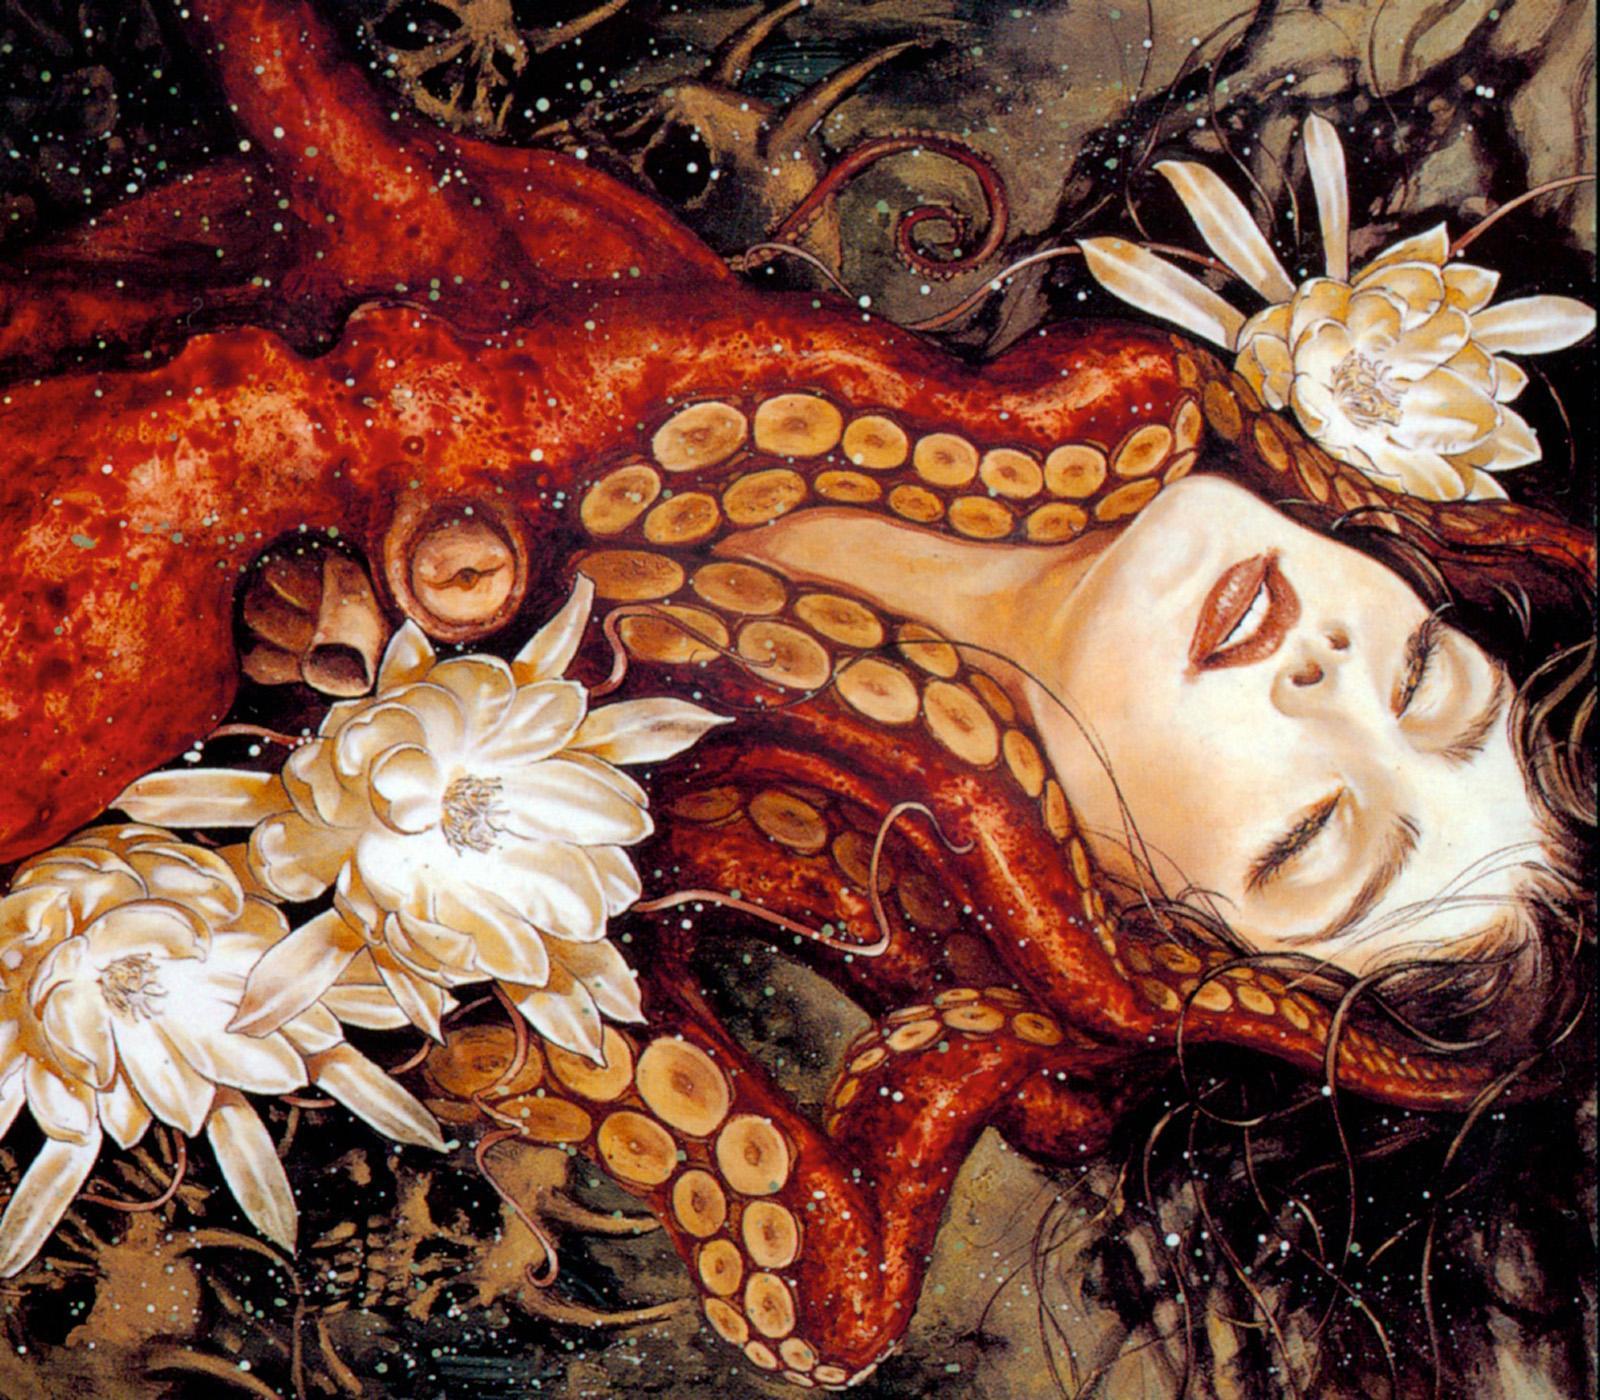 Fantasy Women Wallpaper/Background 1600 x 1400 - Id: 94974 - Wallpaper Abyss